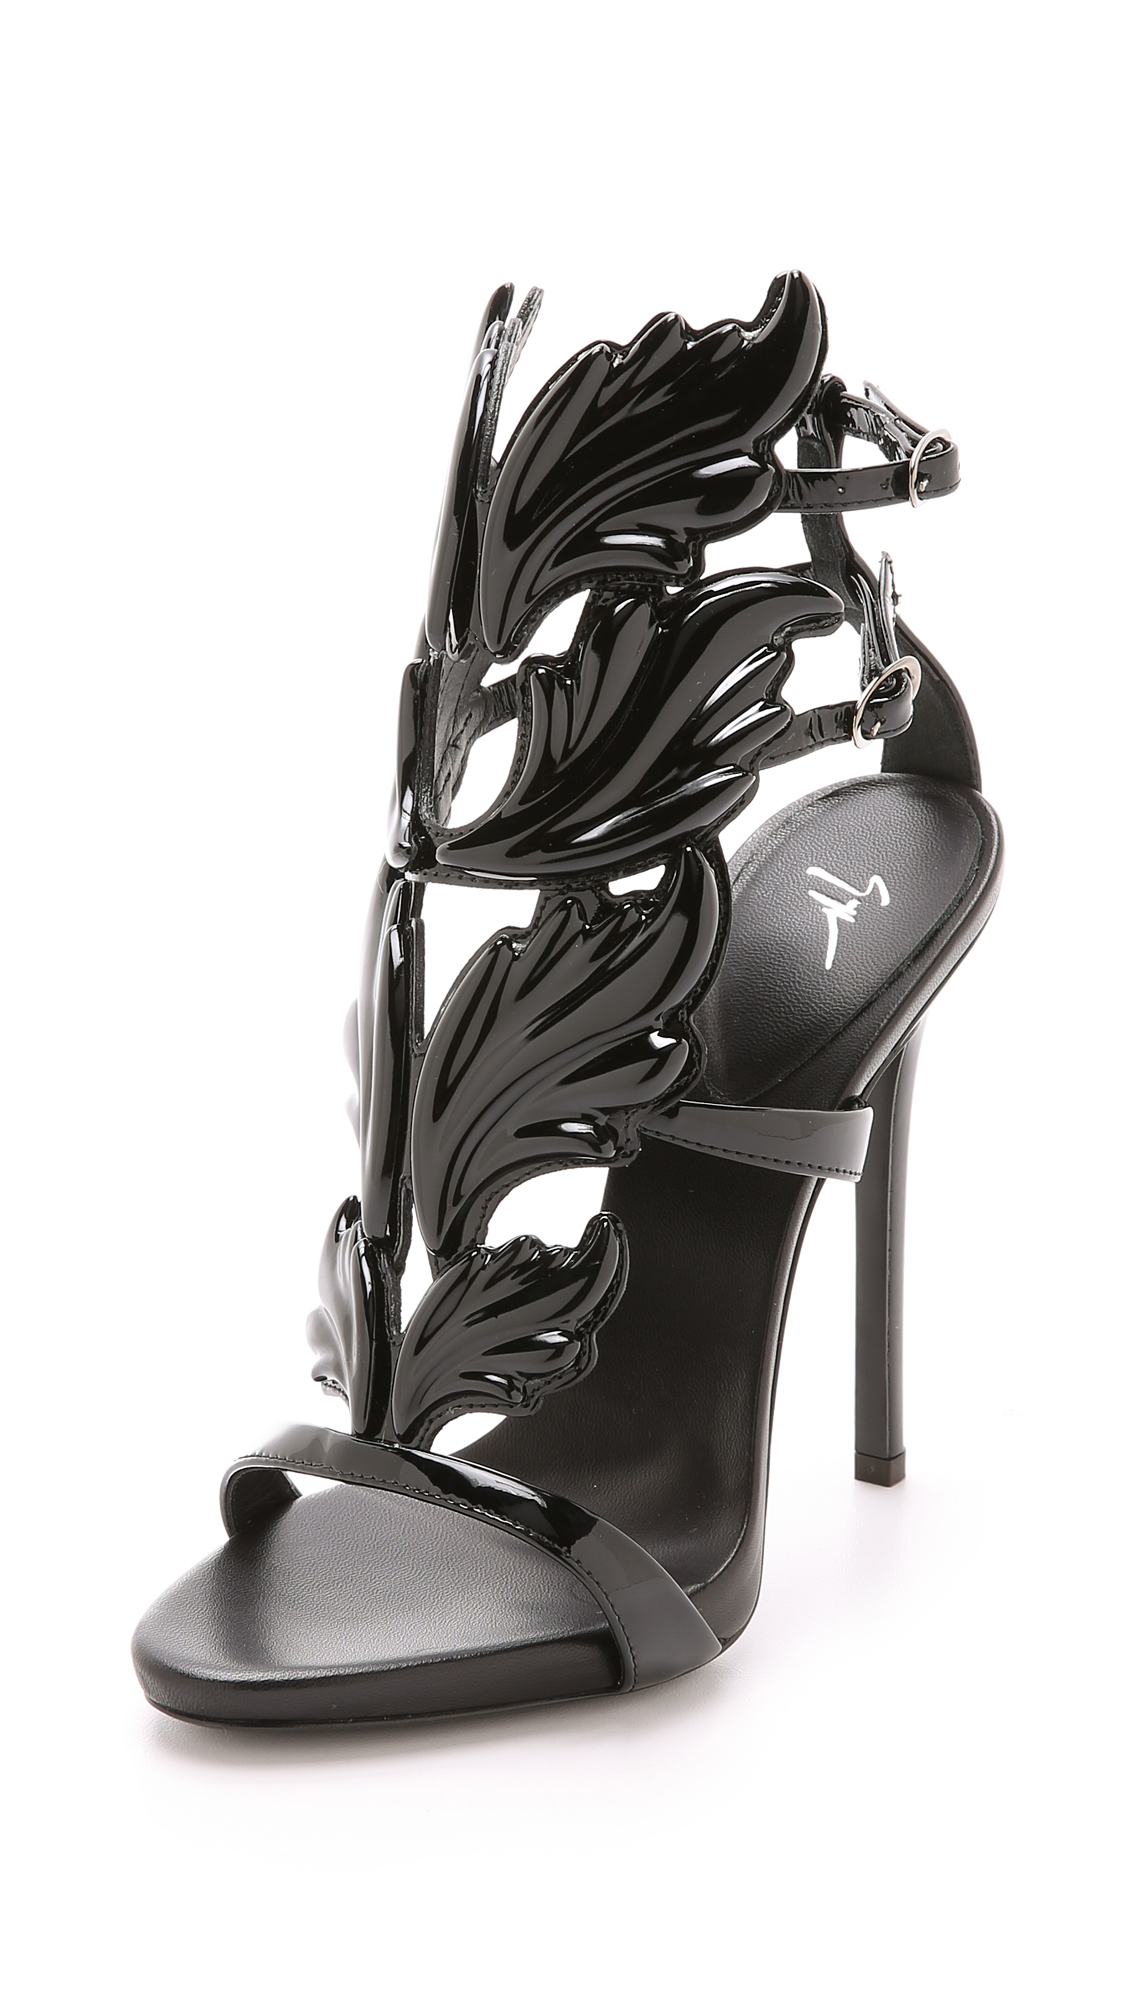 2342b83f931 ... canada giuseppe zanotti metal wing sandals in black lyst 0a18c c4f09